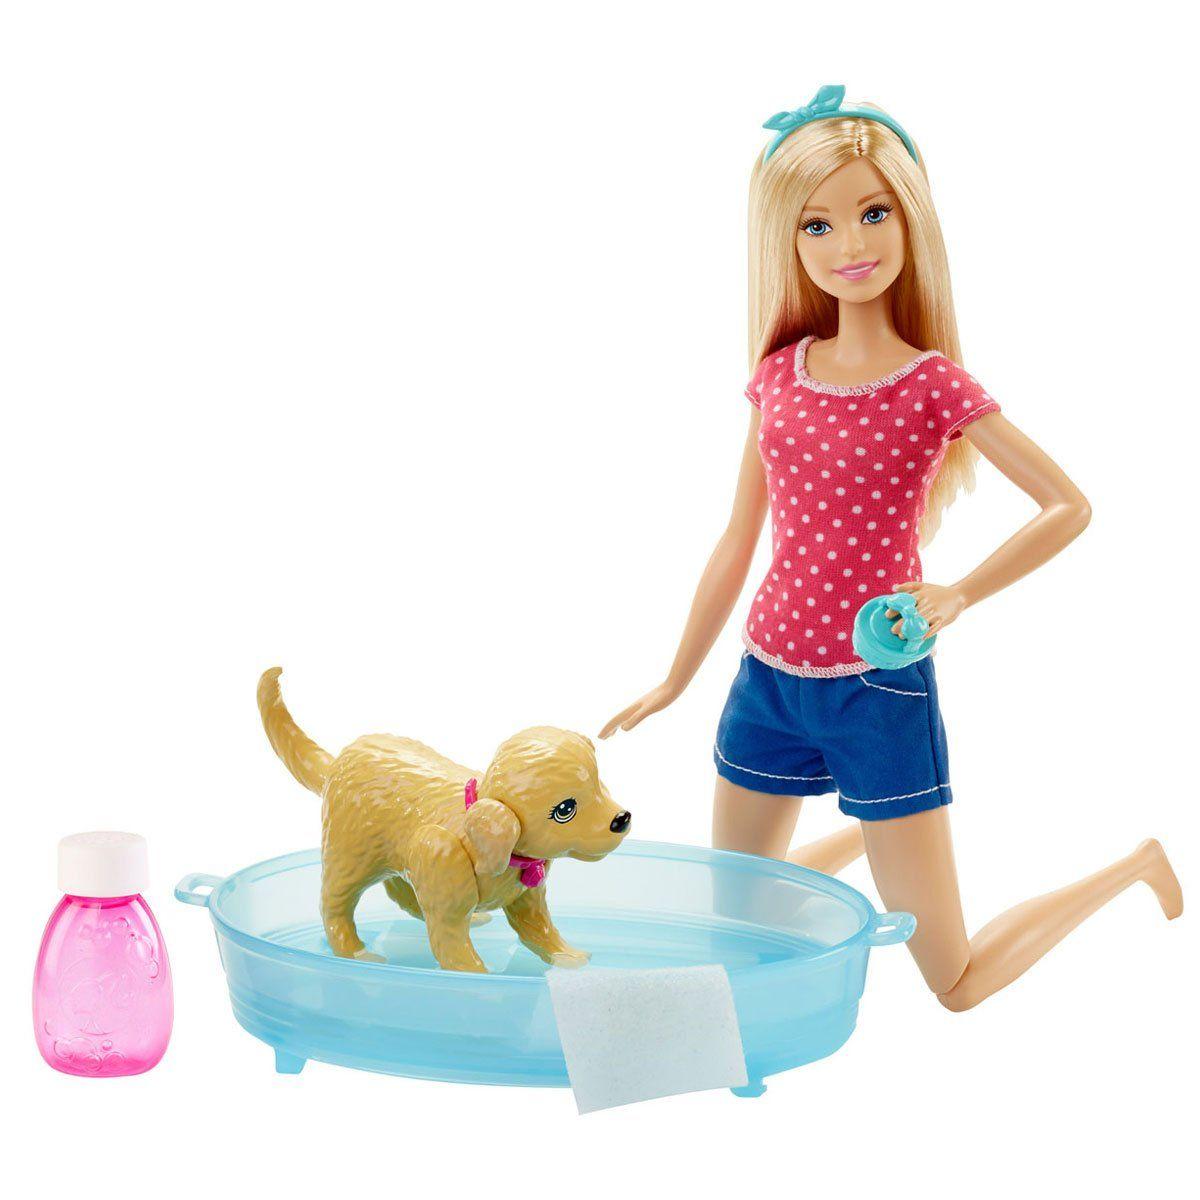 Barbie Bano De Perritos Sears Com Mx Me Entiende Bano Para